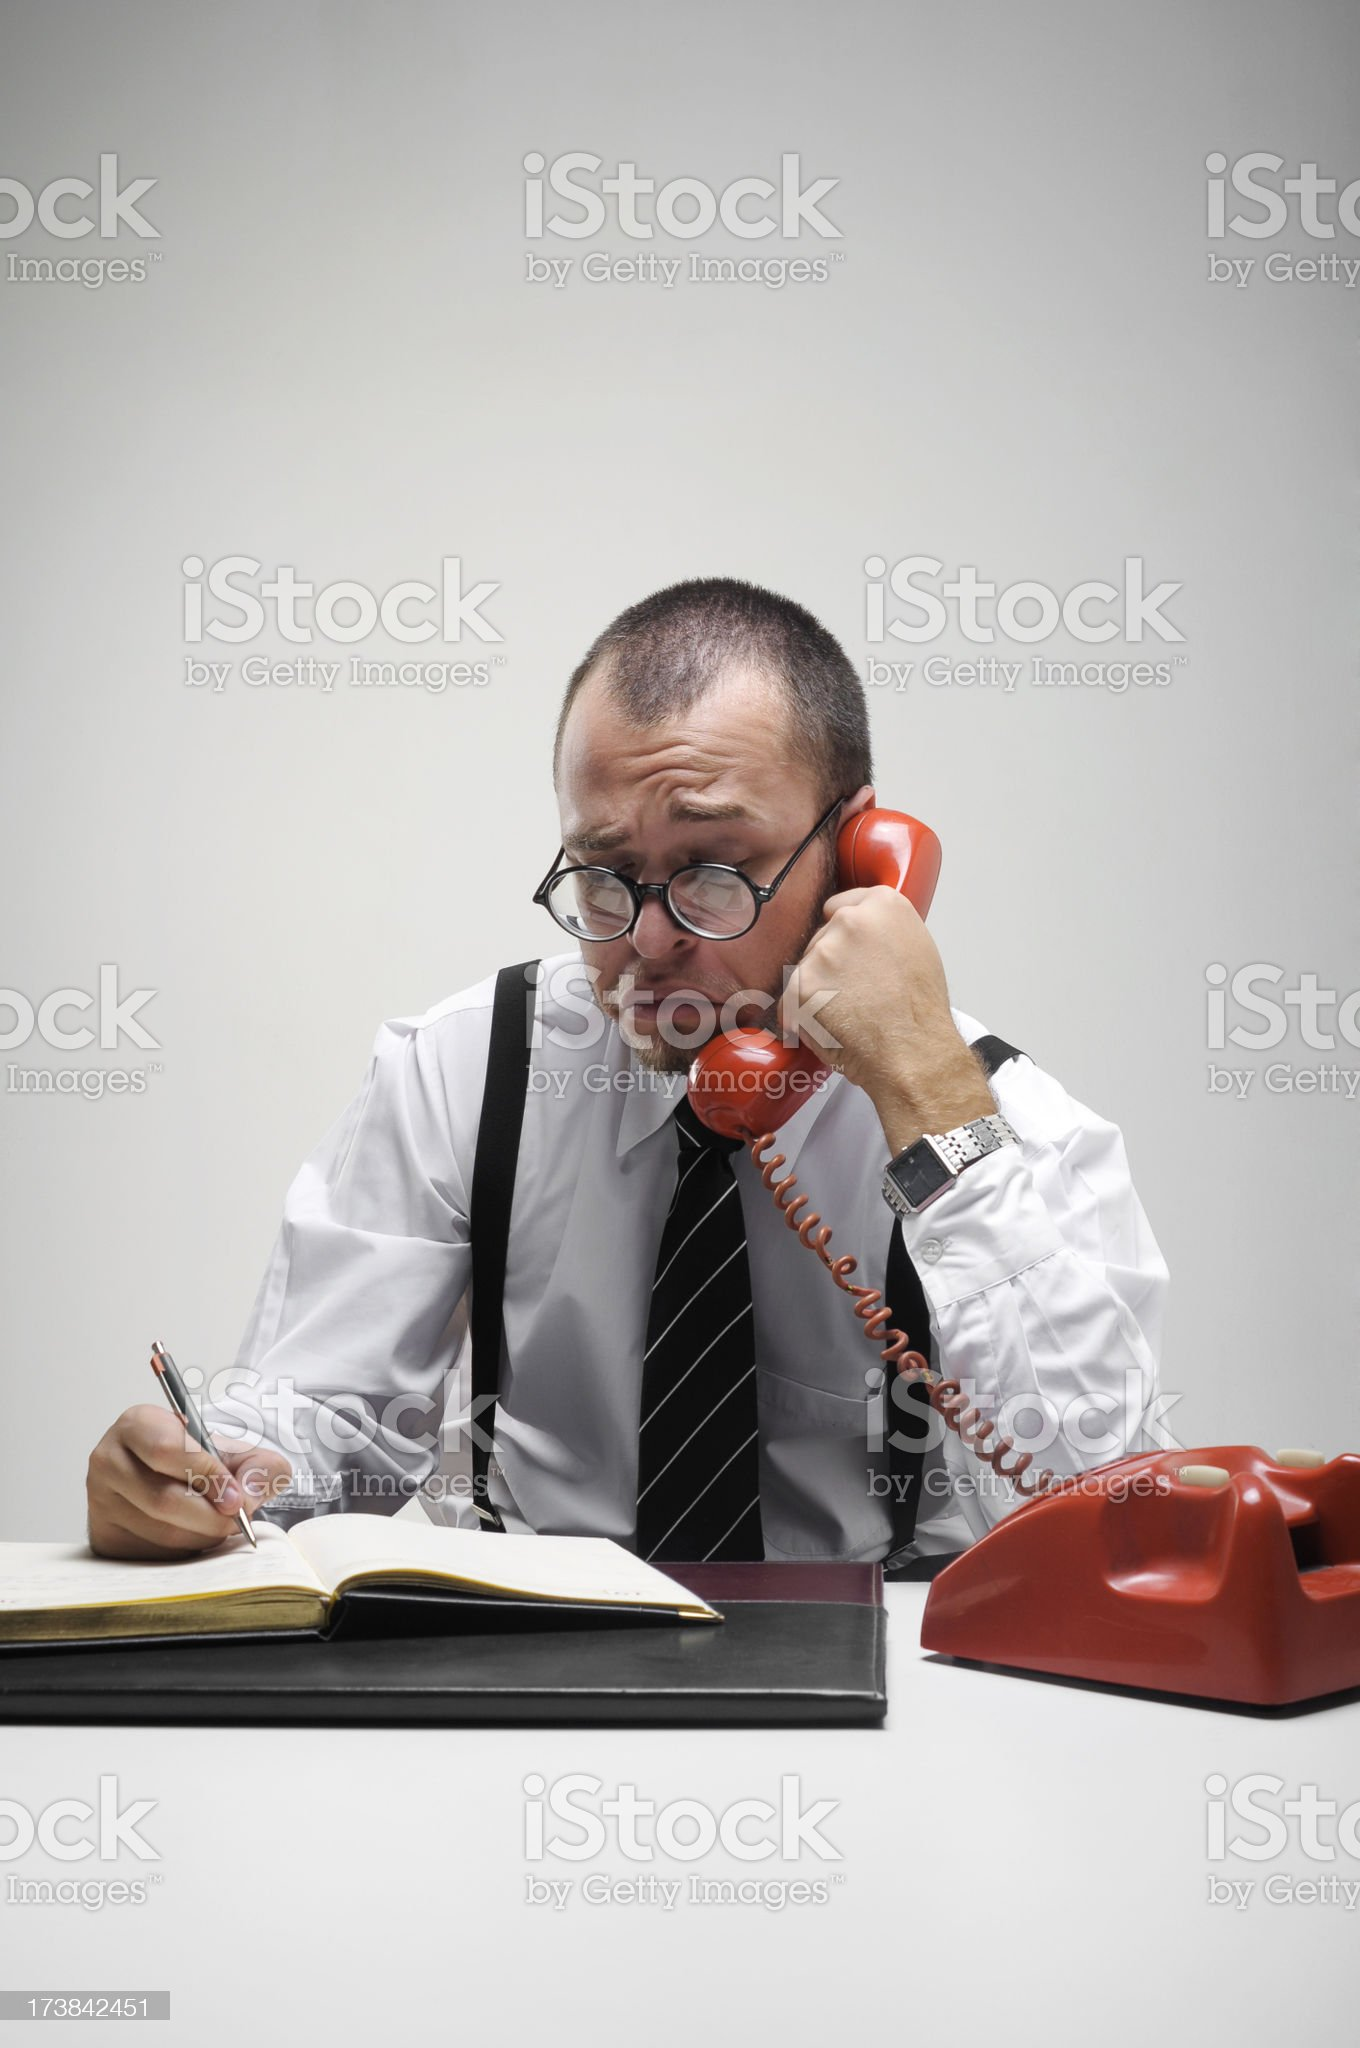 Officeman royalty-free stock photo